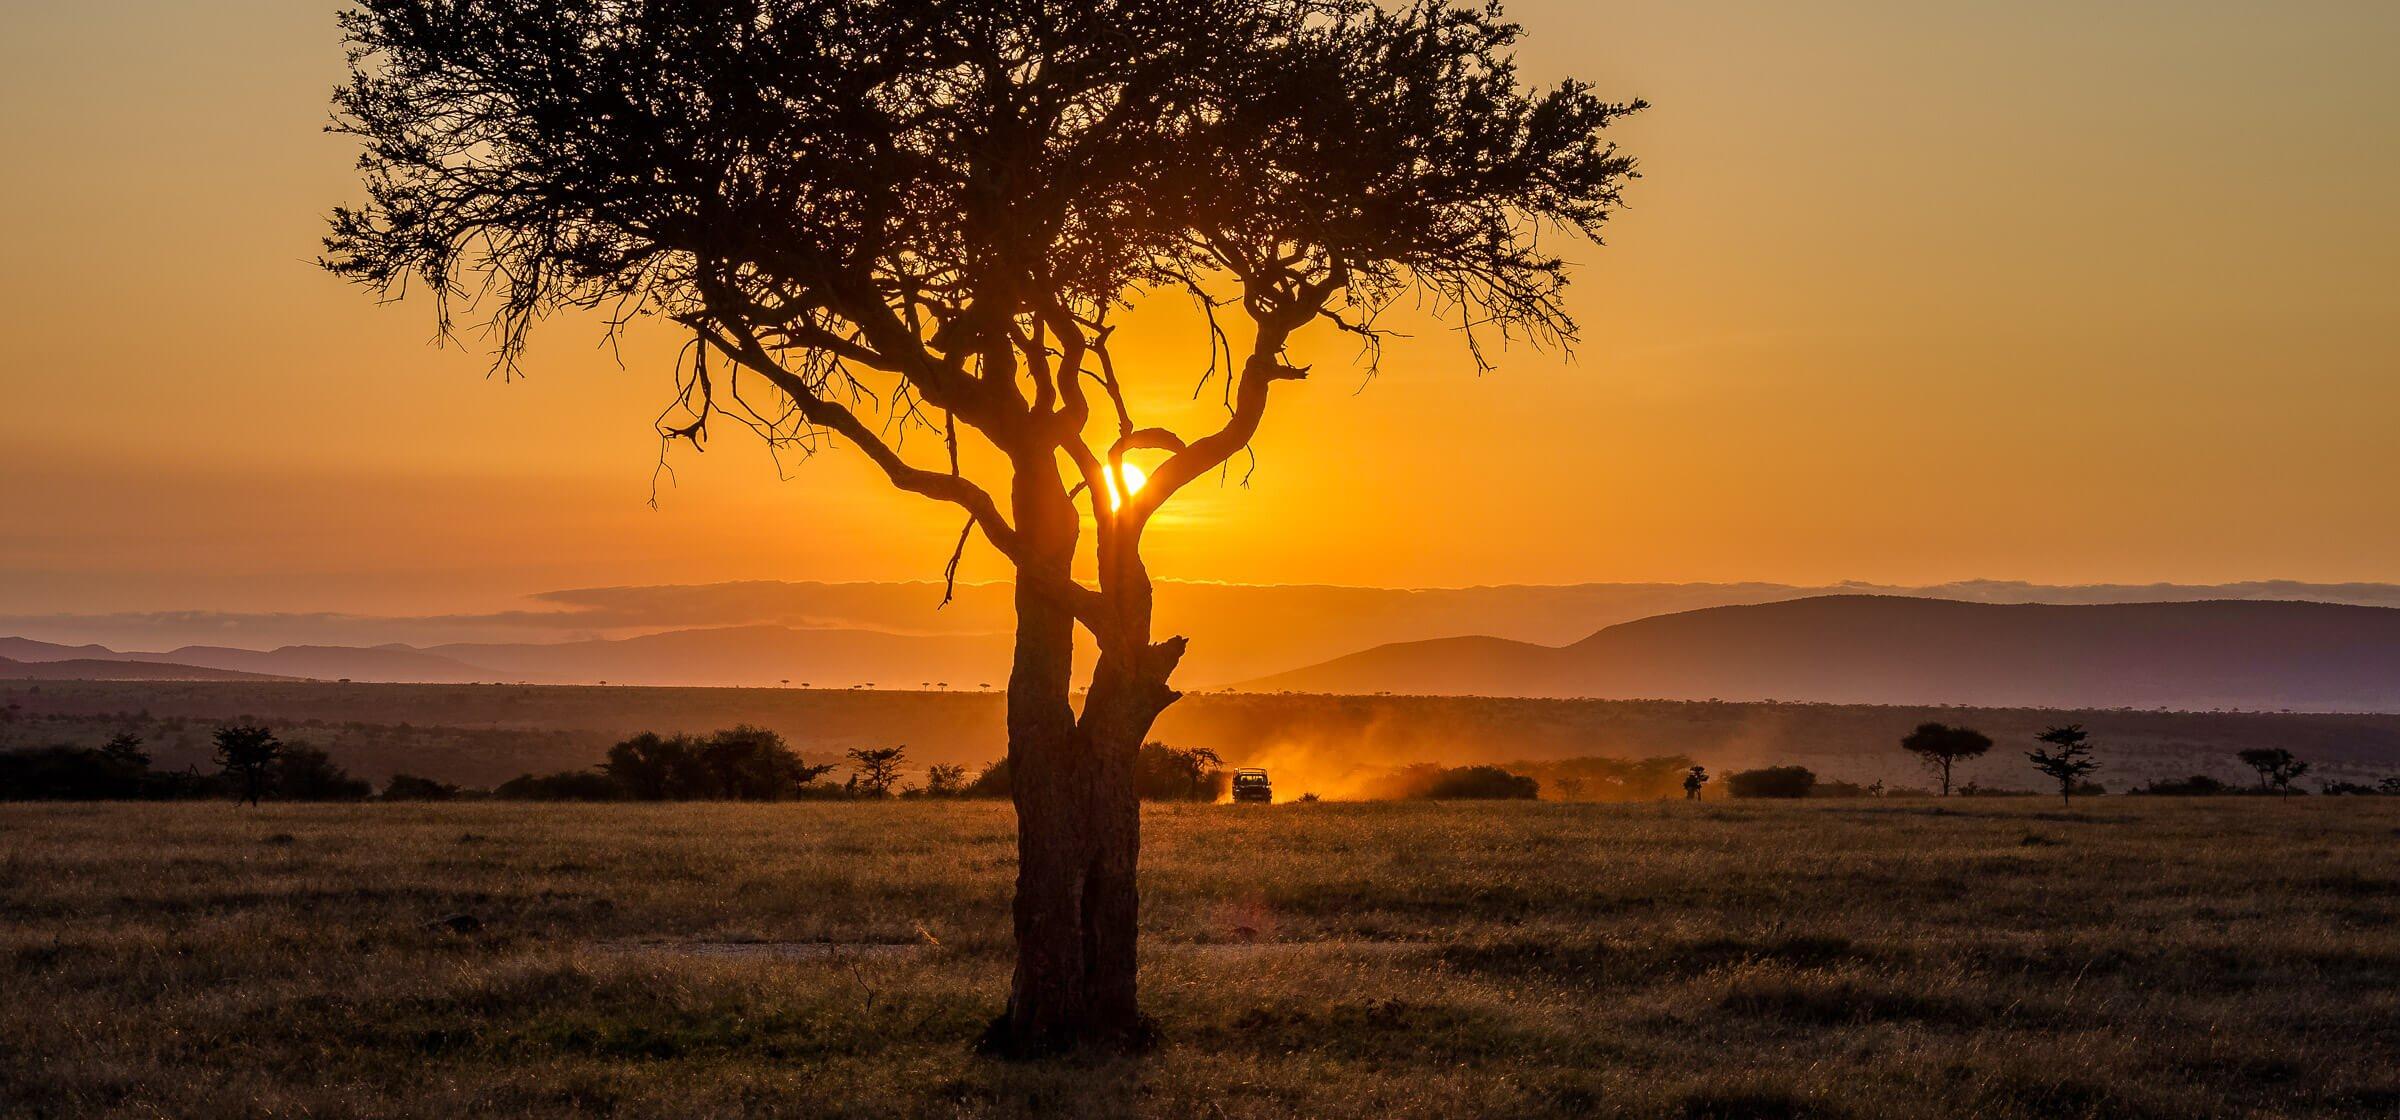 Sun set behind an acacia tree with a safari jeep on the plains of Masai Mara